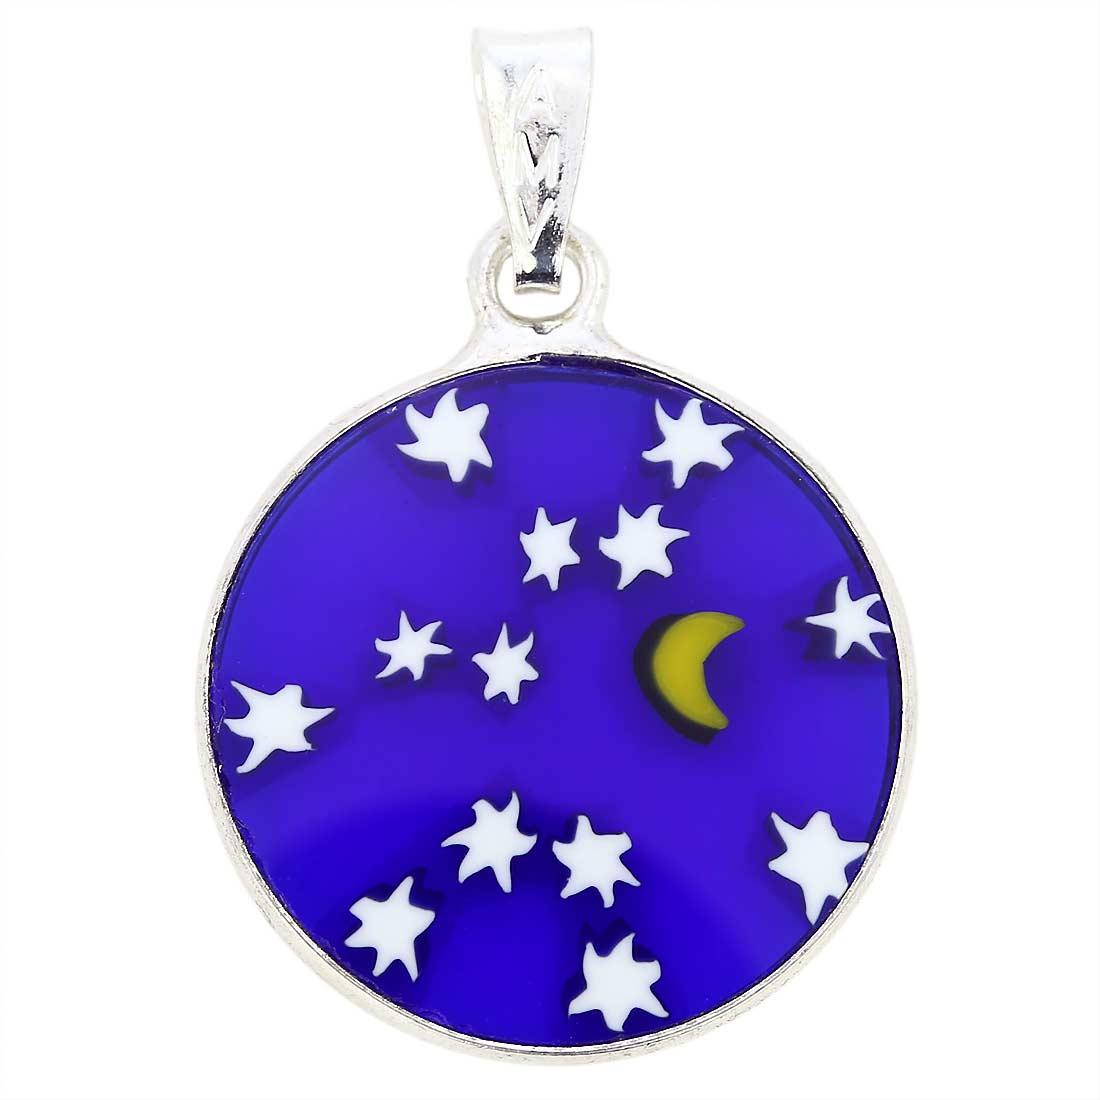 "Small Millefiori Pendant \""Starry Night\"" in Silver Frame 18mm"